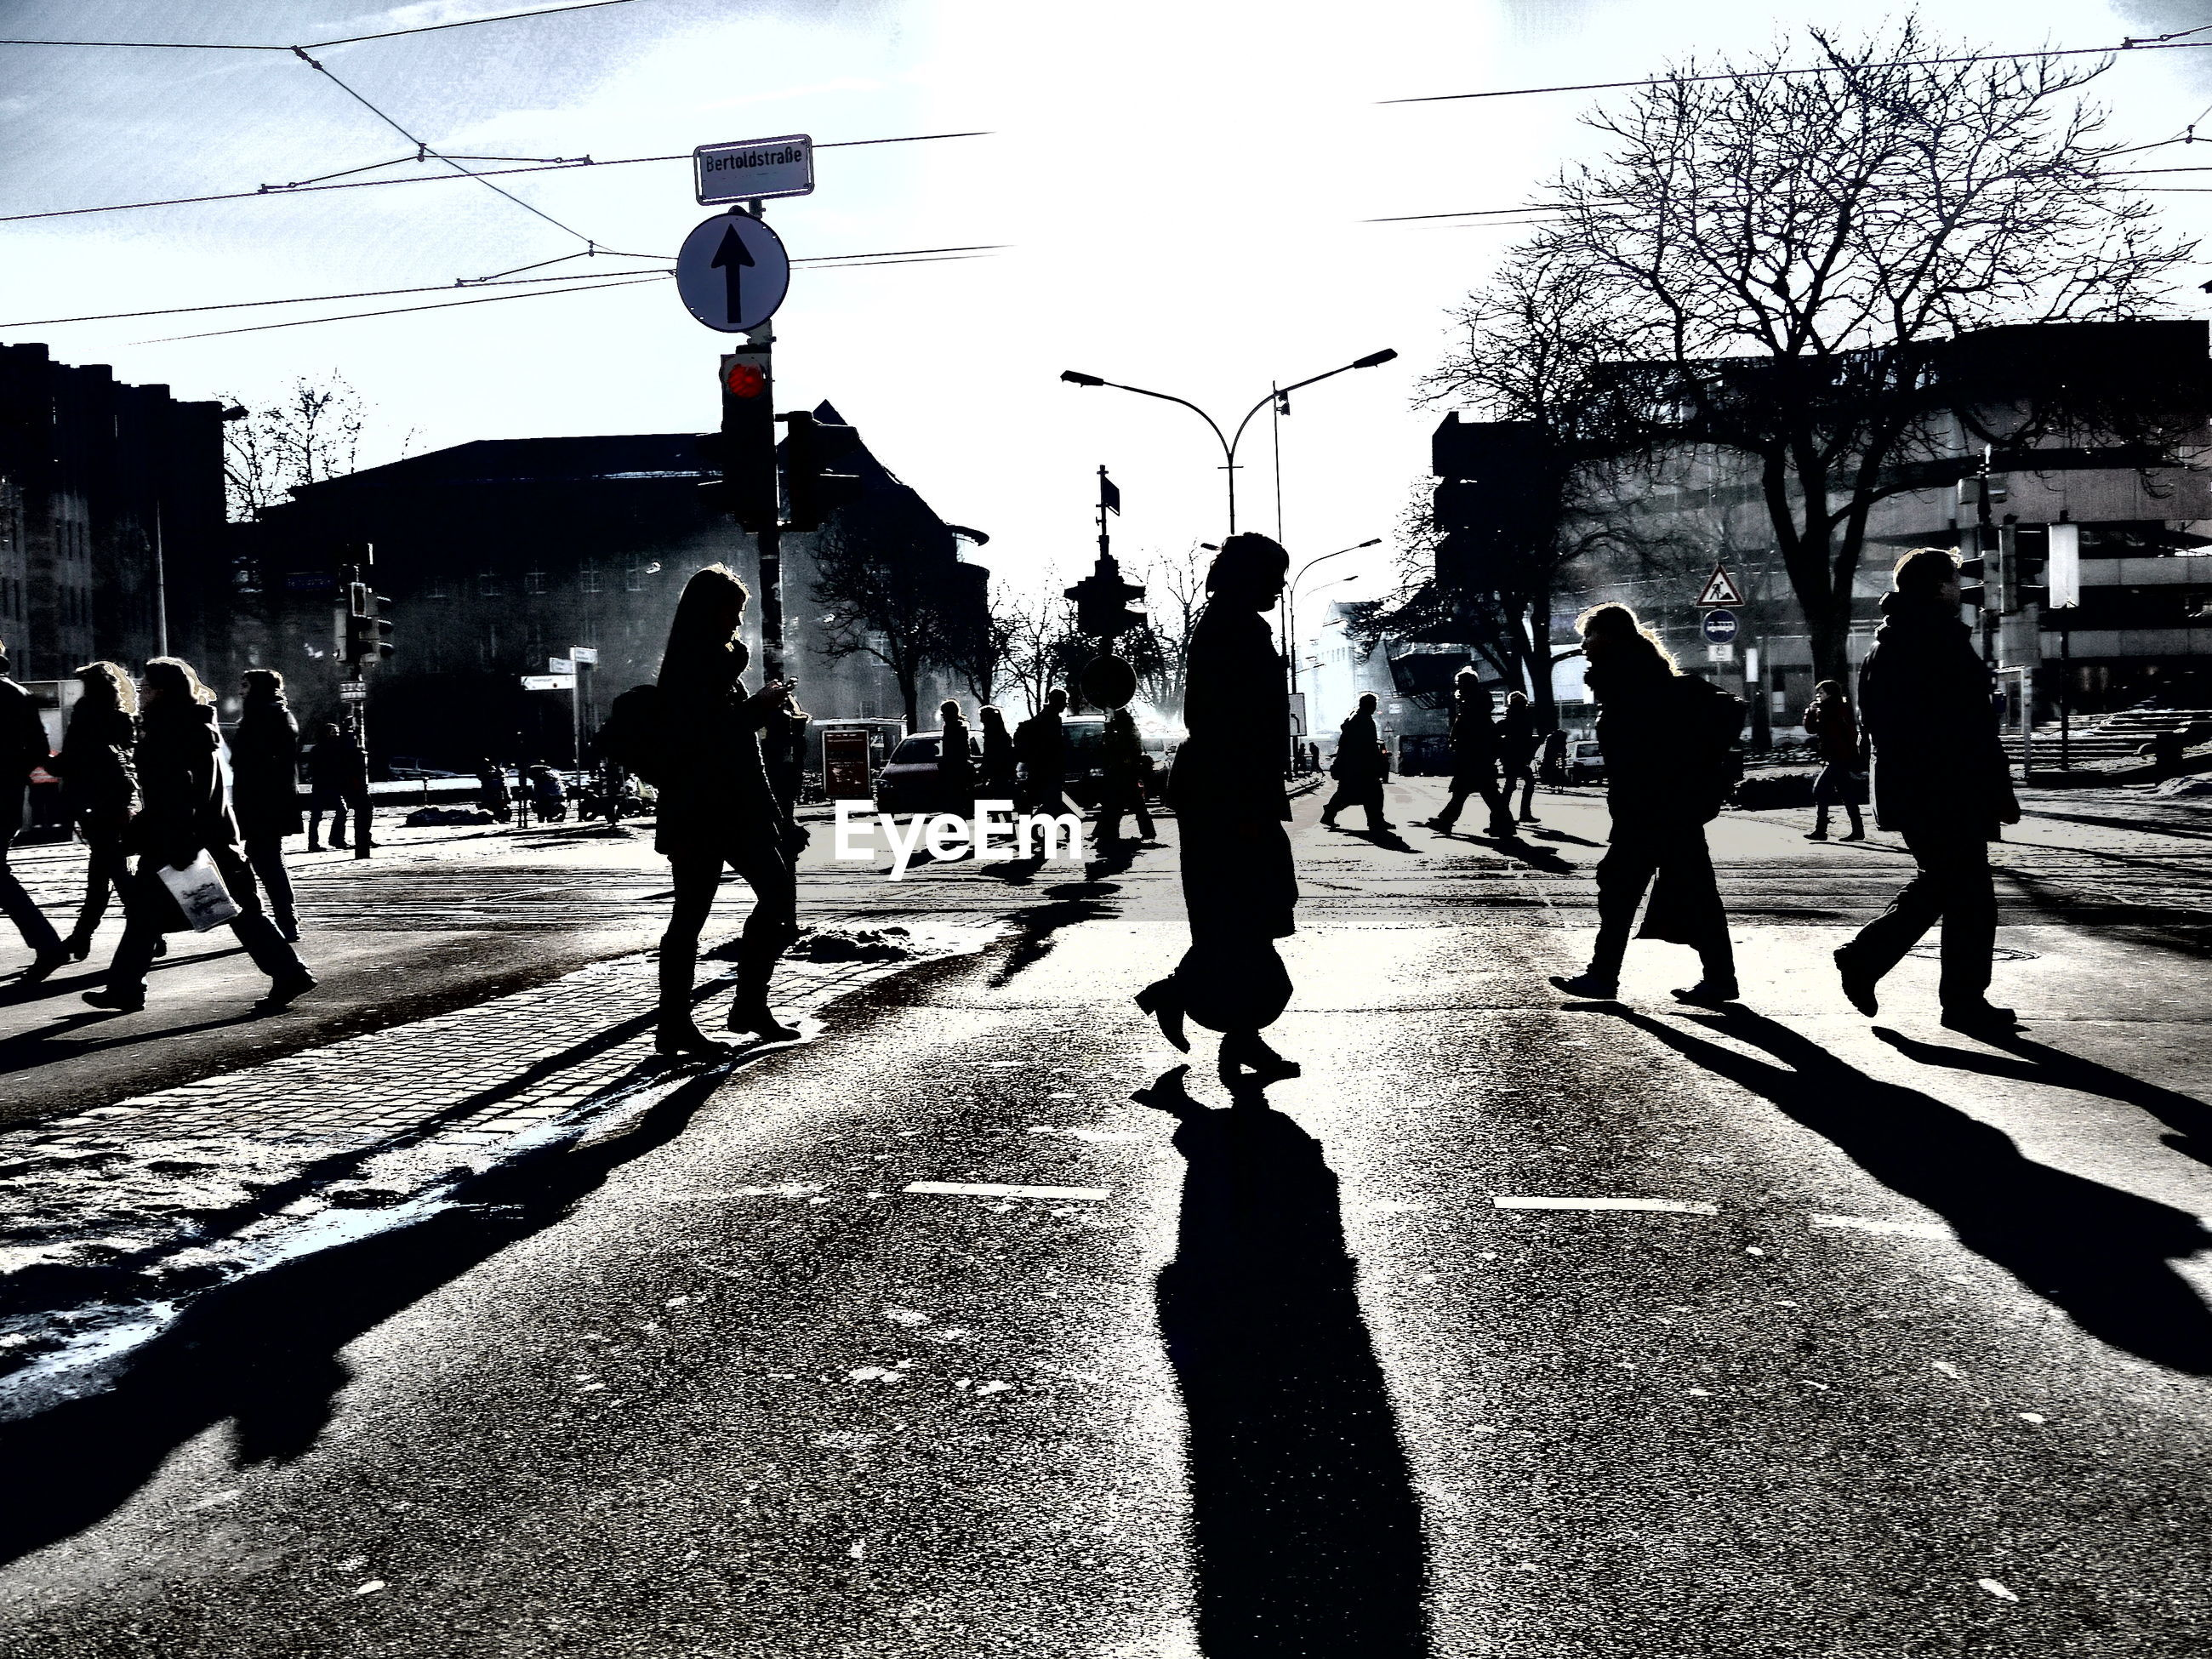 Silhouette people walking on street in city against sky